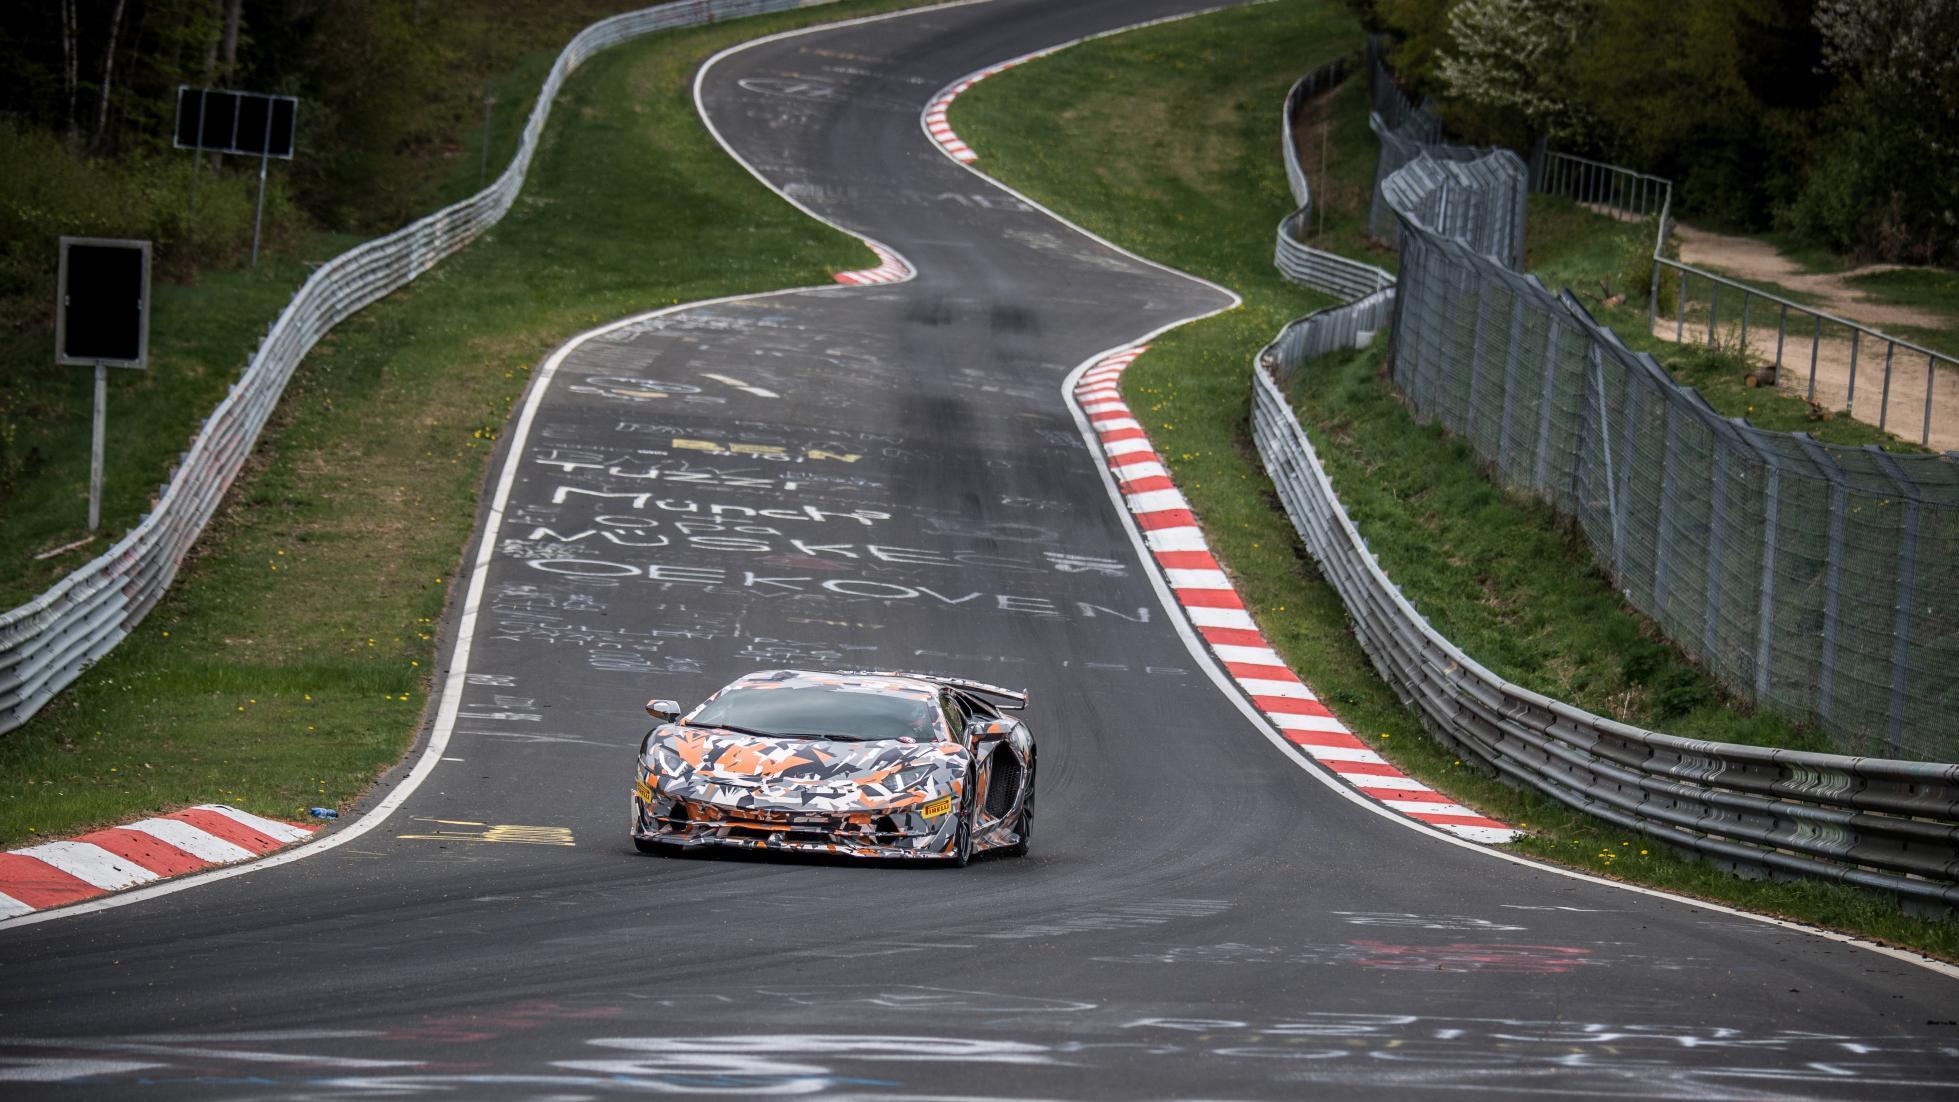 Lamborghini Aventador SVJ Nürburgring